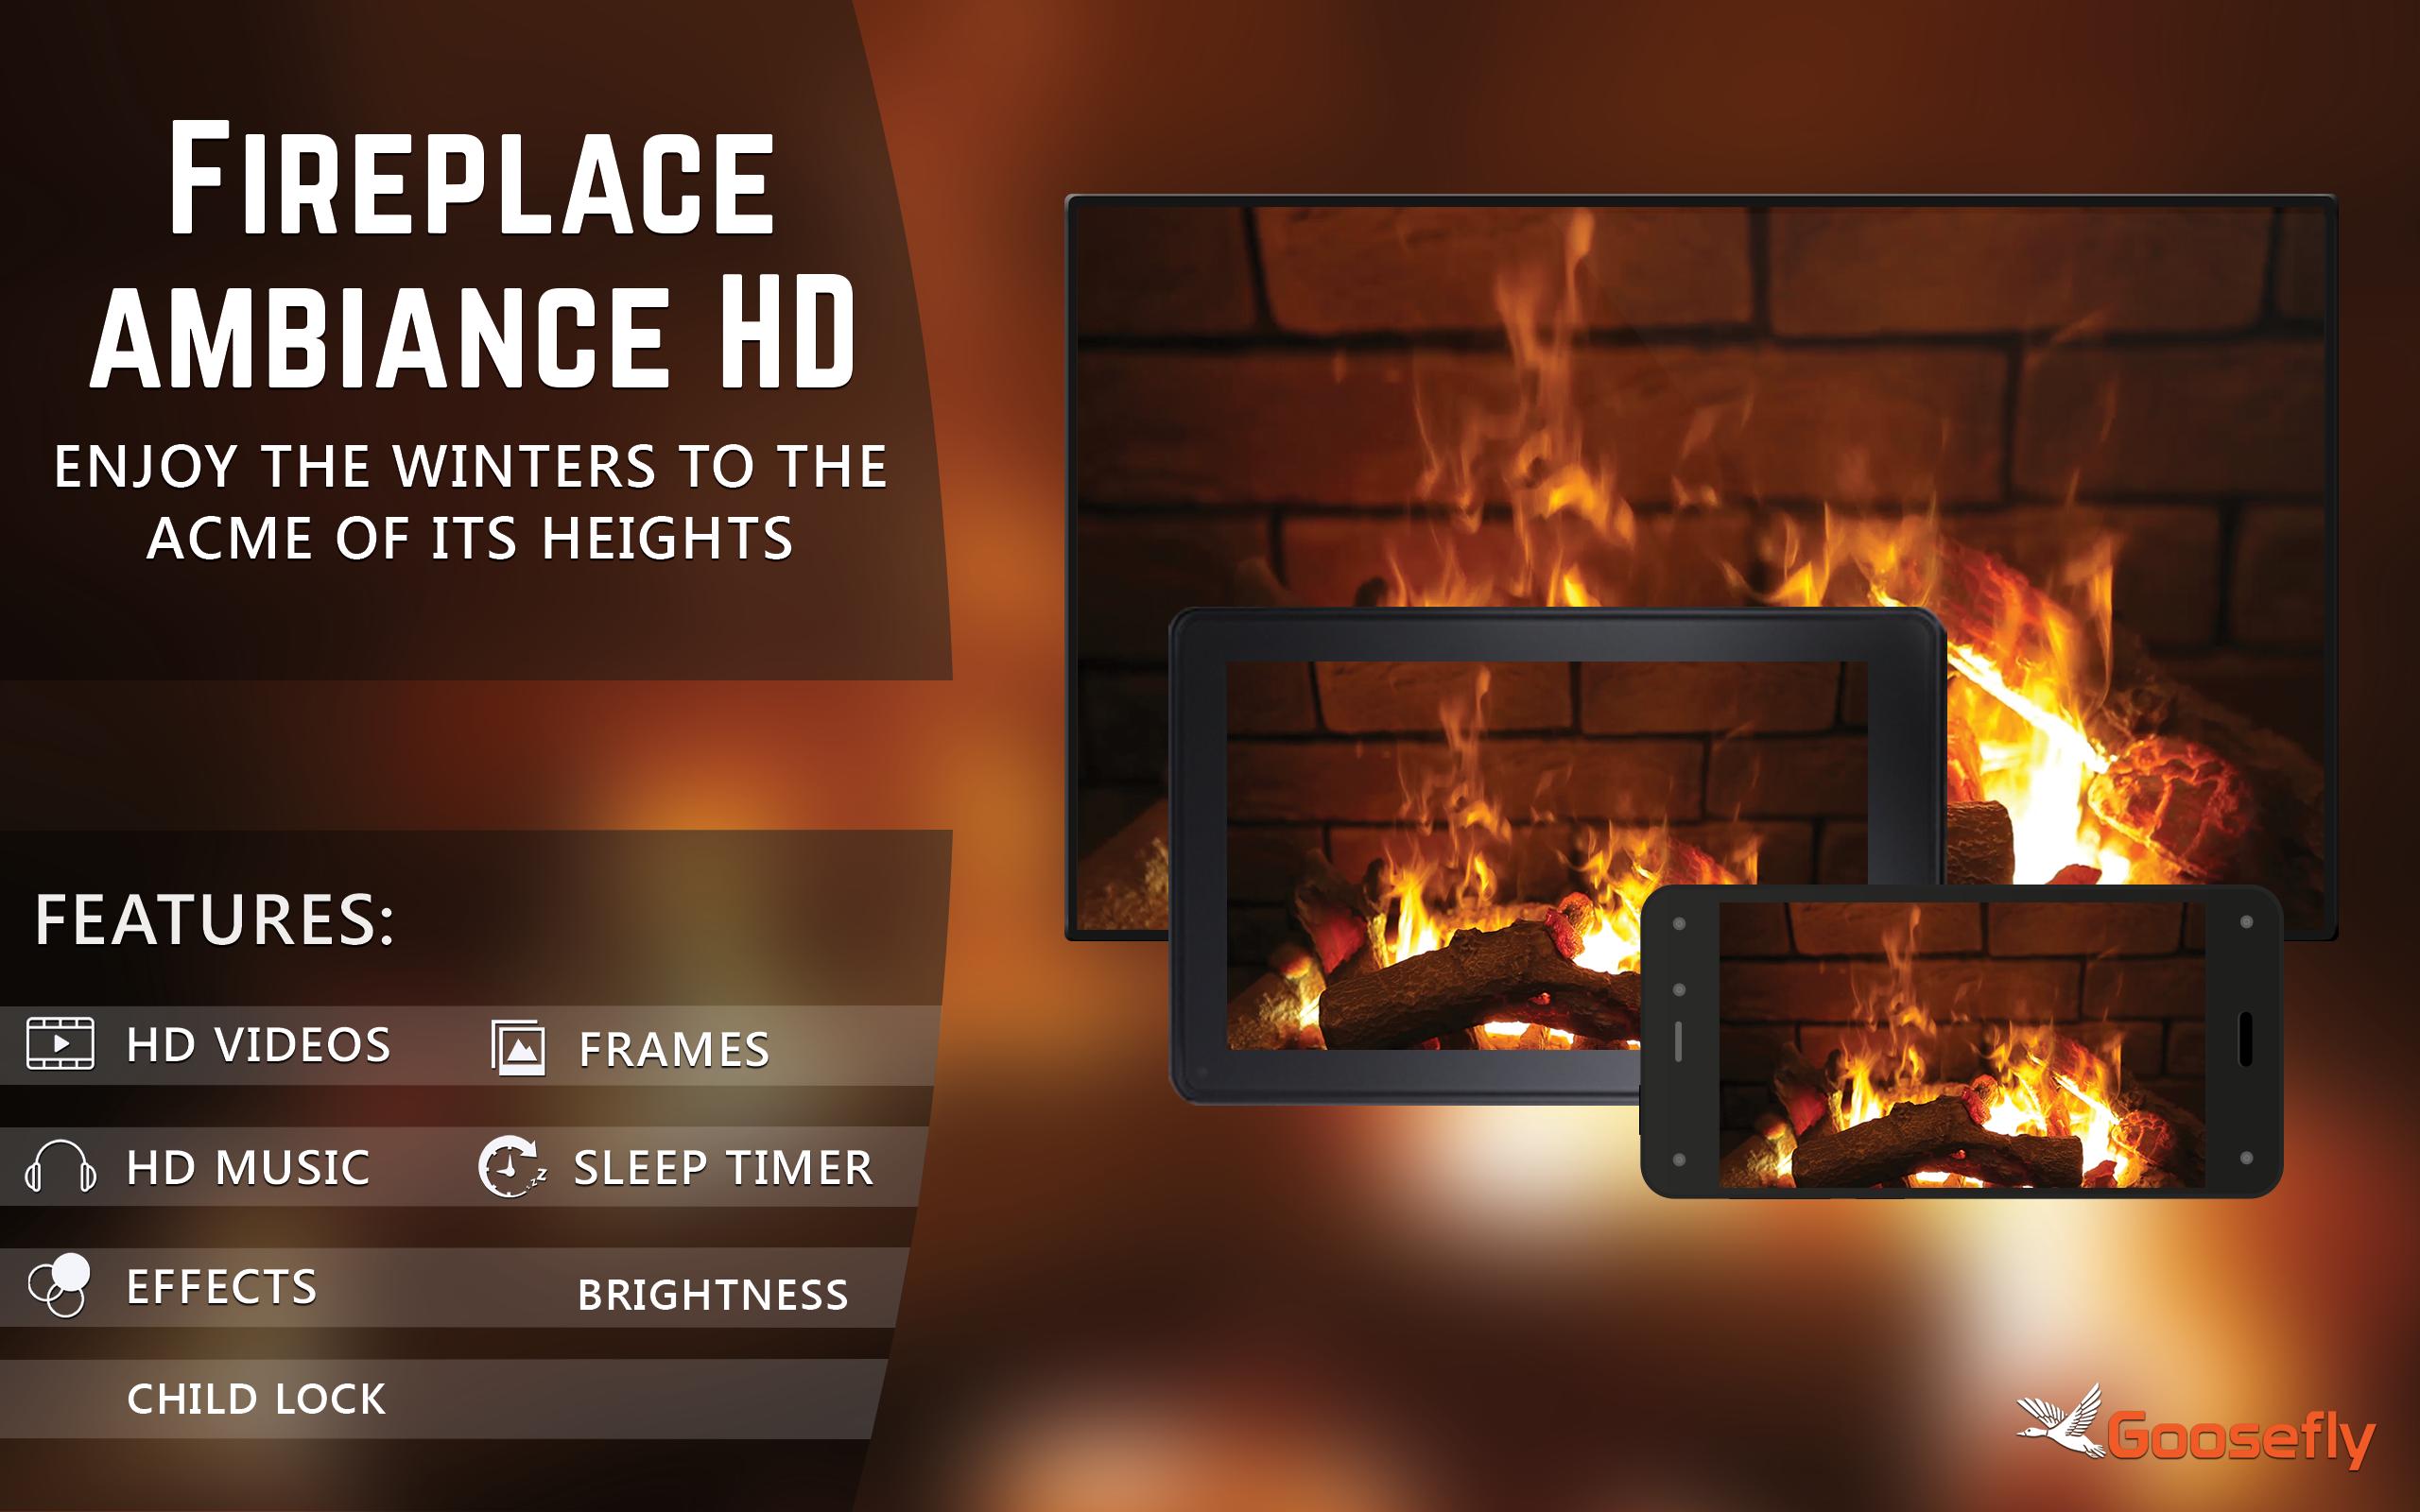 Amazon.com: Fireplace Ambiance HD - Wallpaper & Themes: Appstore ...